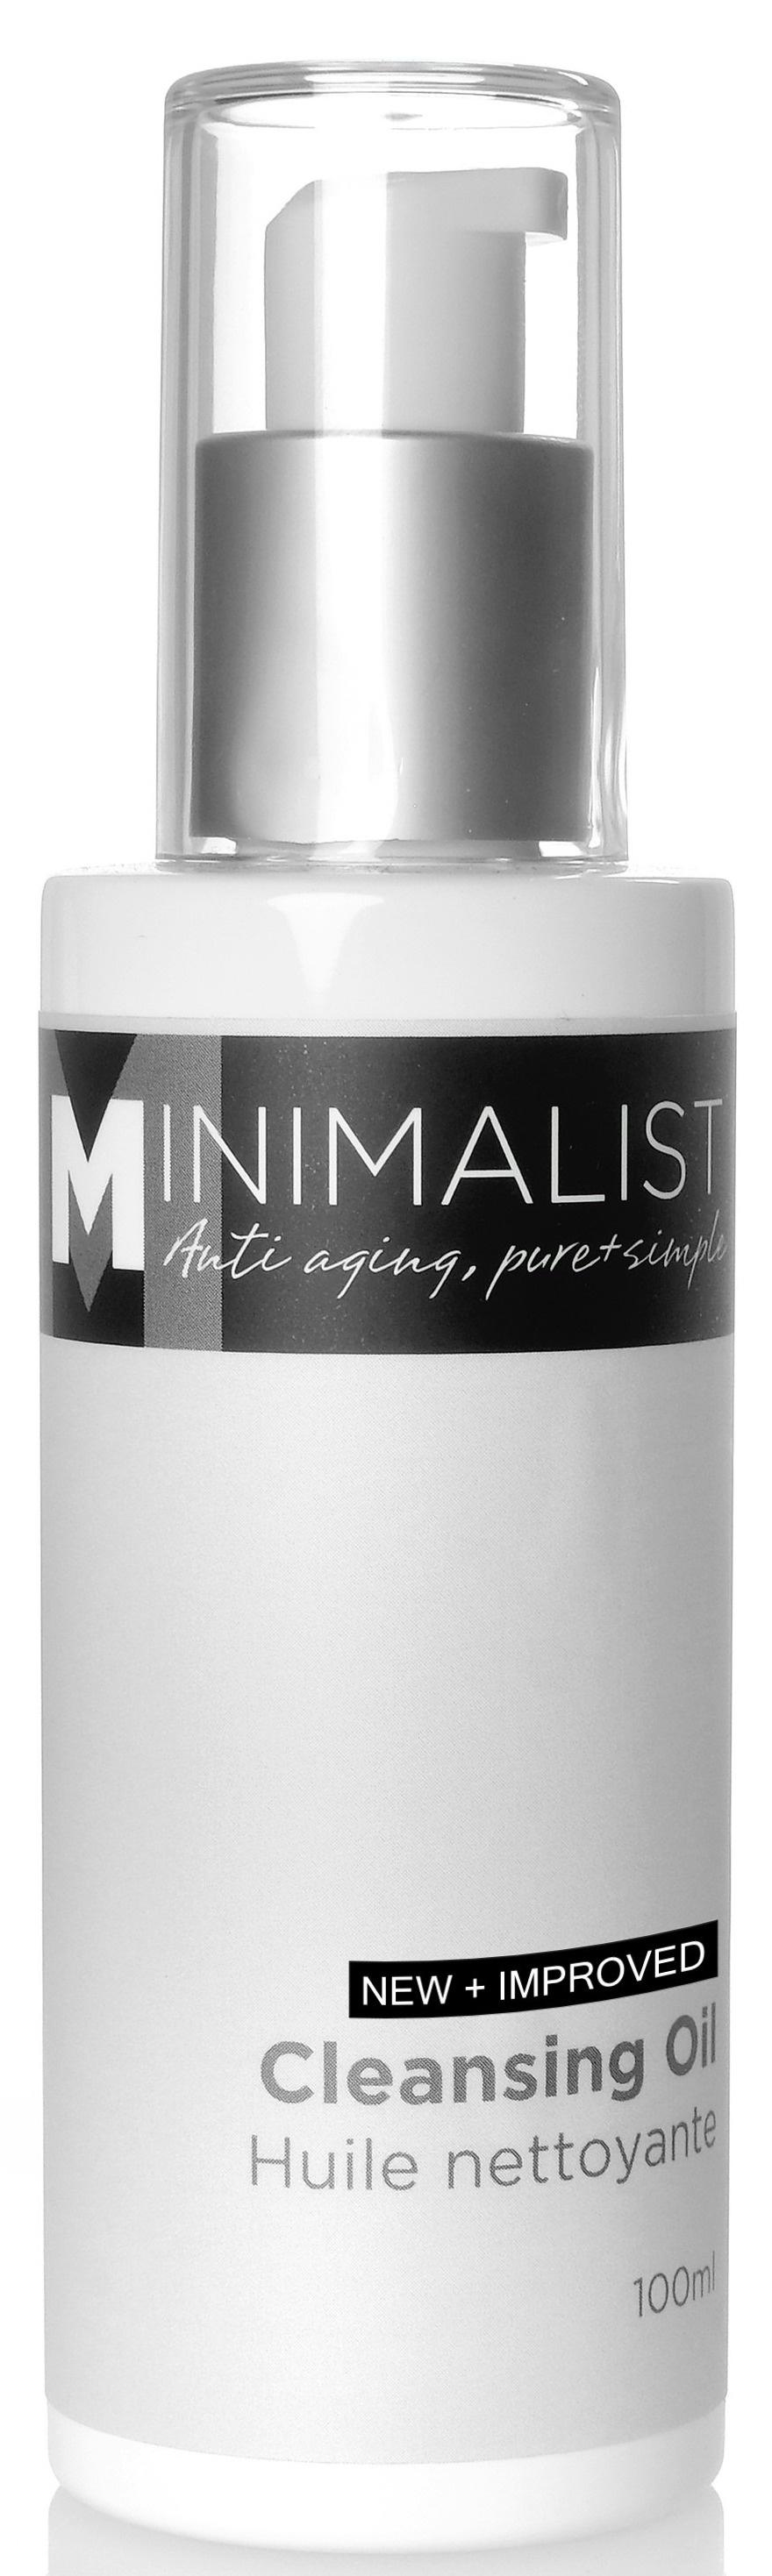 minimalist Cleansing Oil